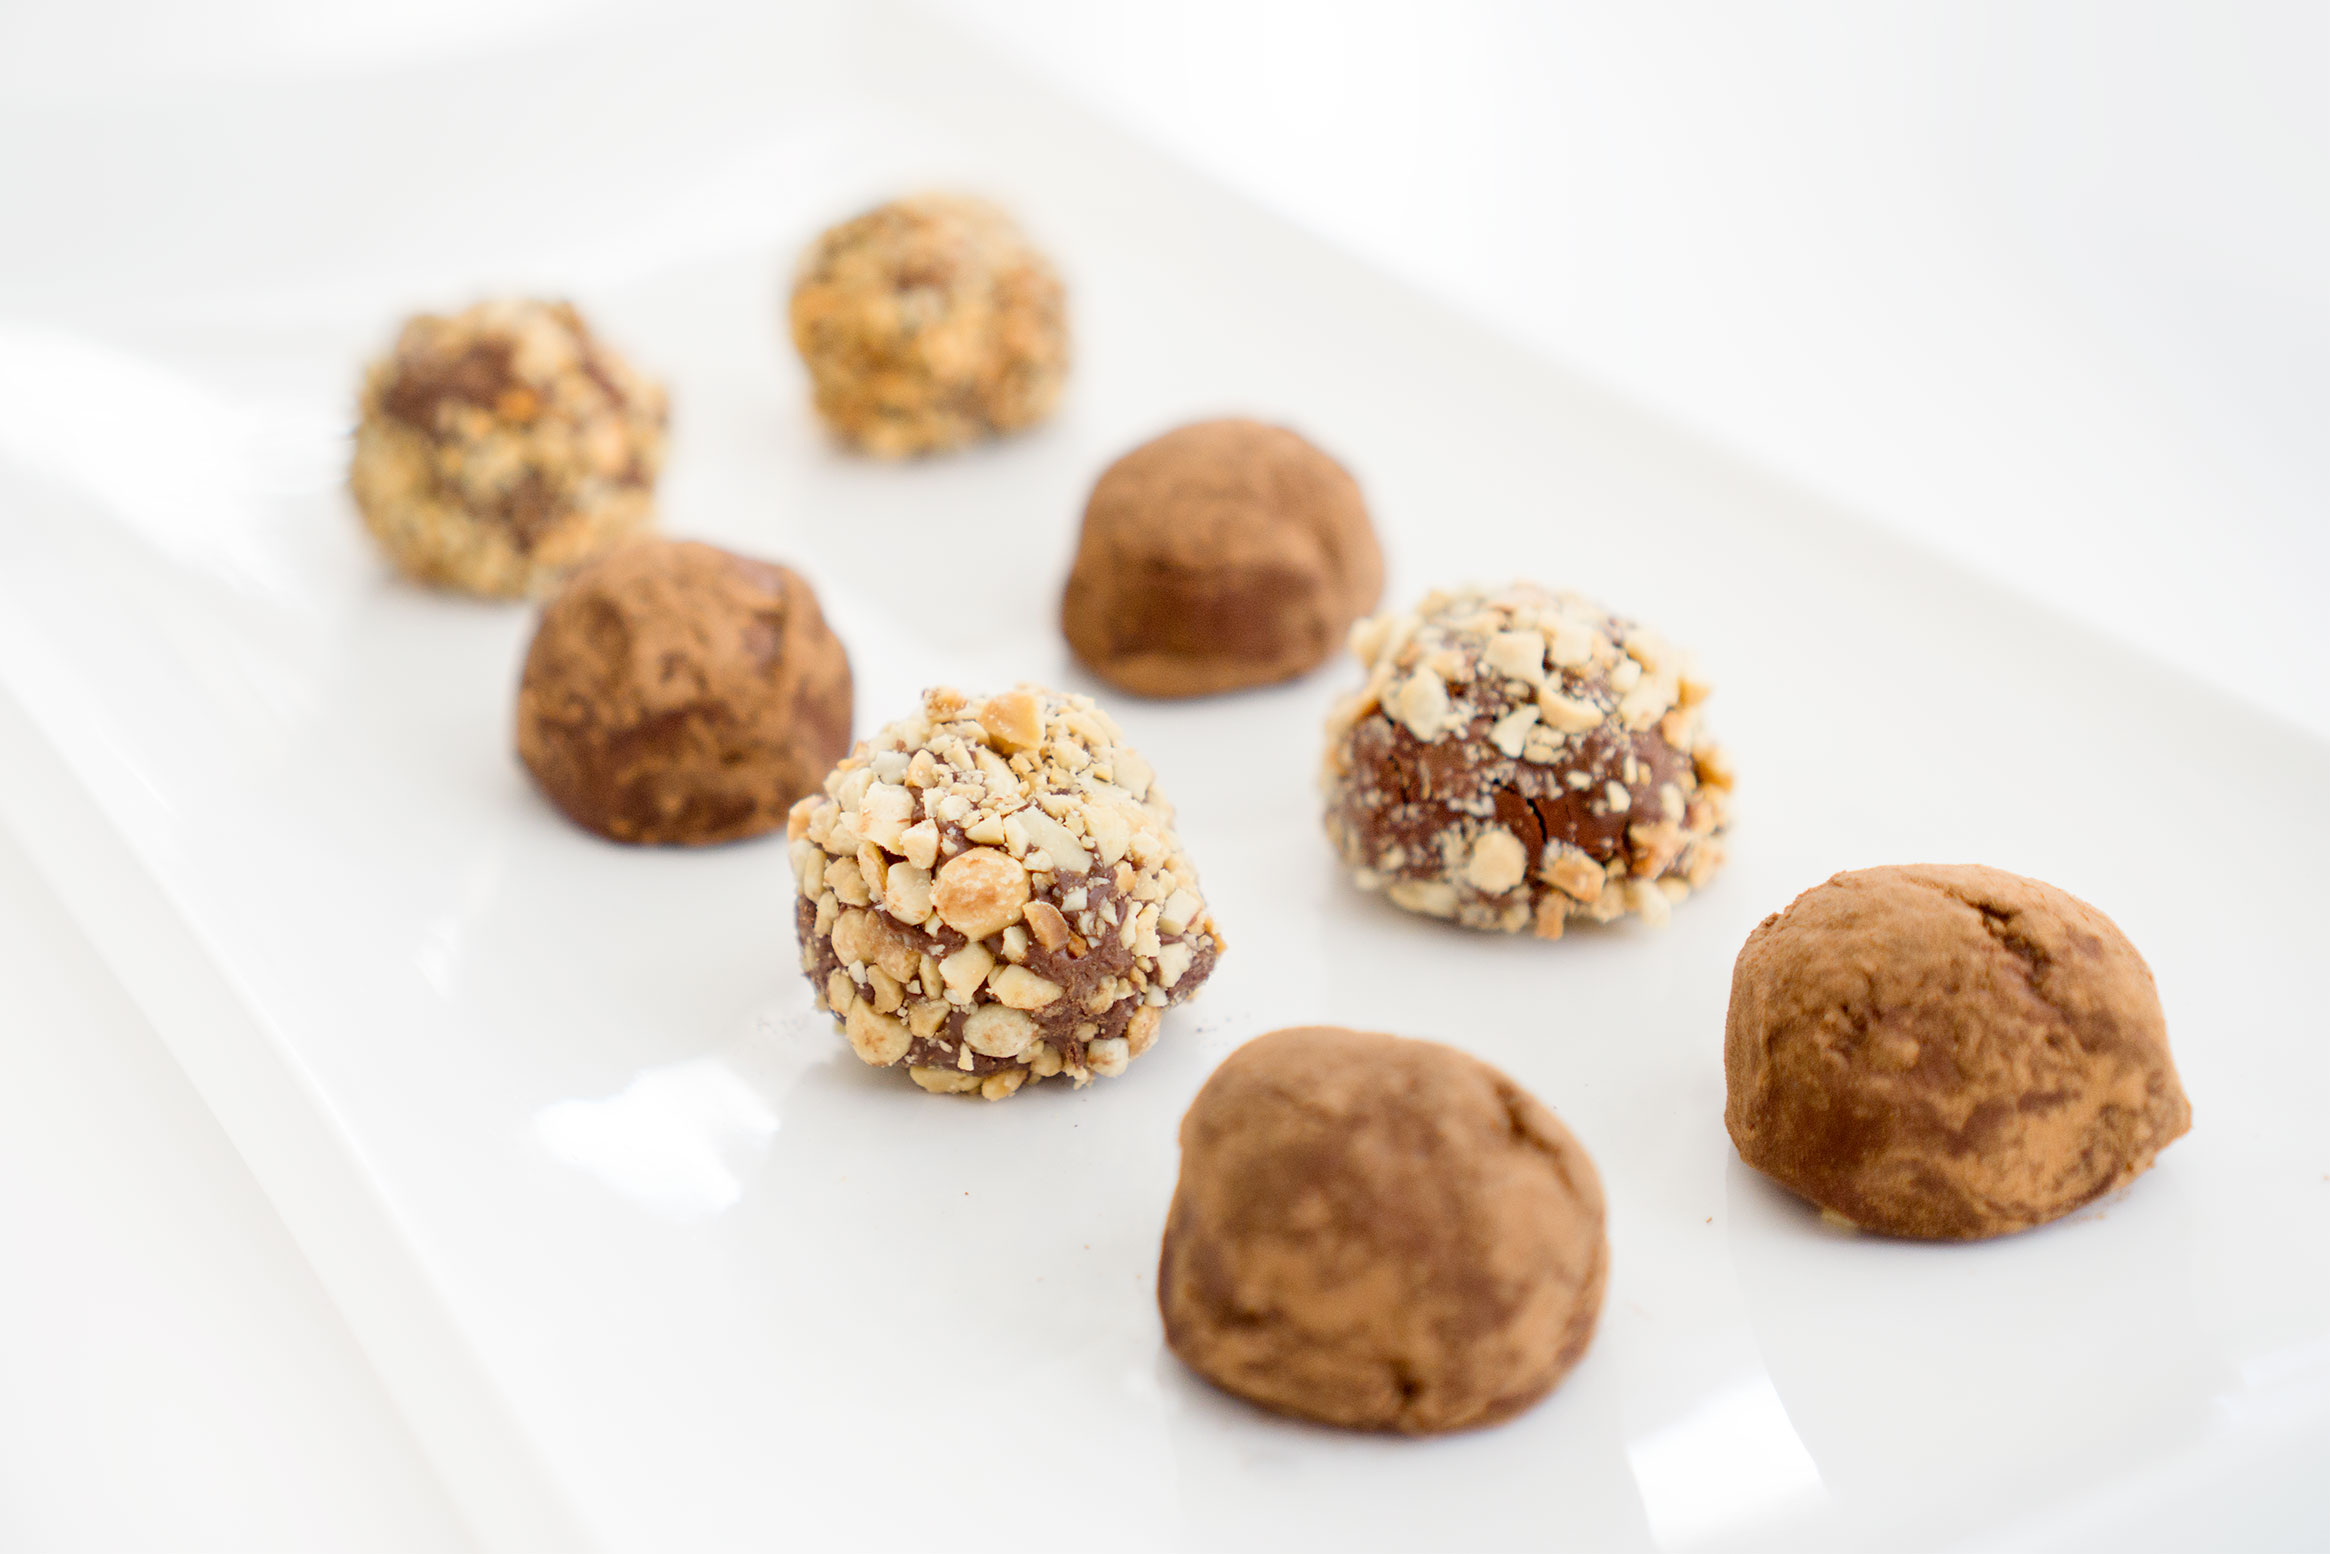 Keto Low Carb Chocolate Truffles